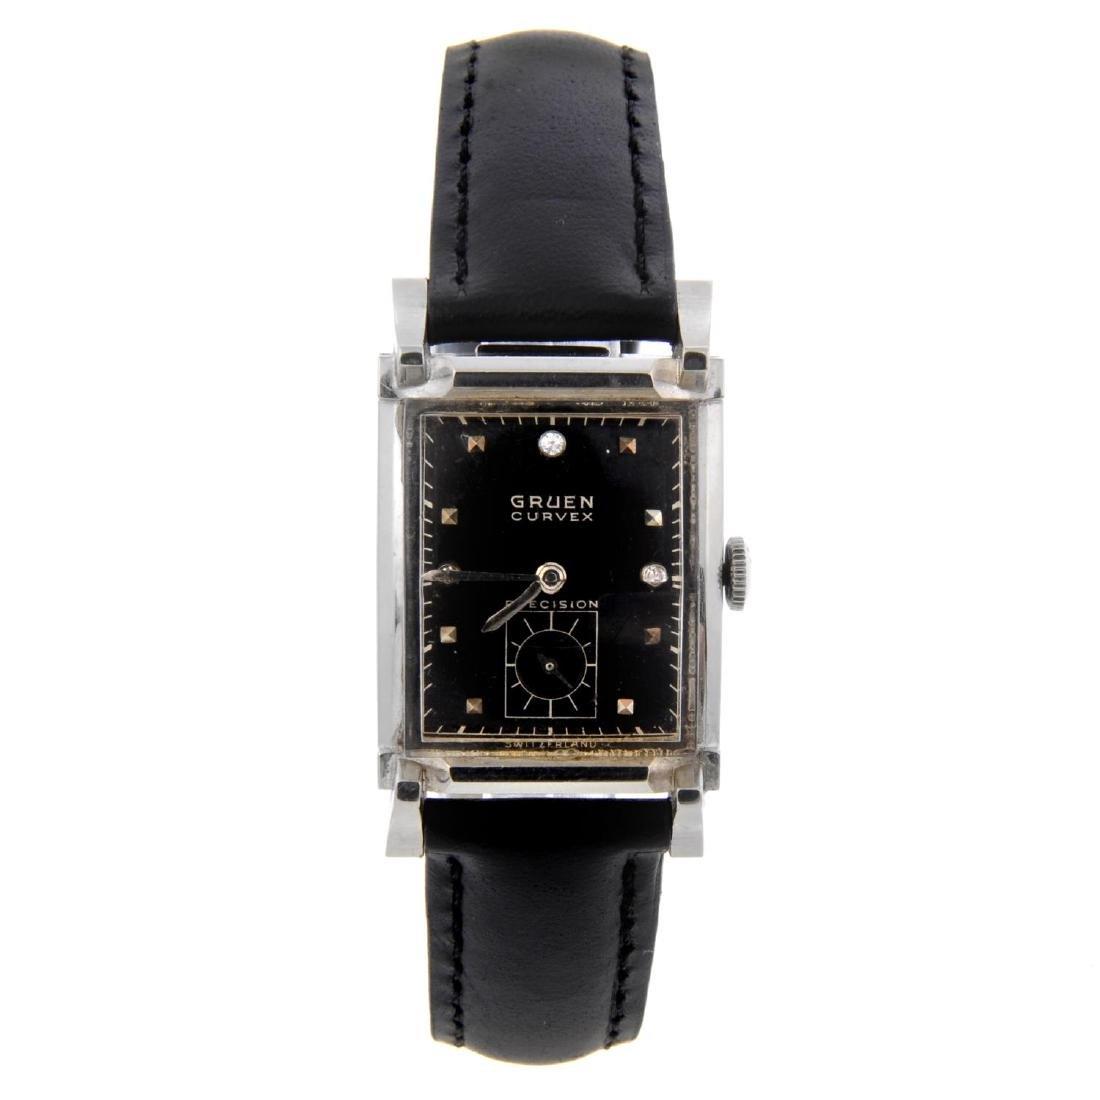 GRUEN - a mid-size Curvex Precision wrist watch. White